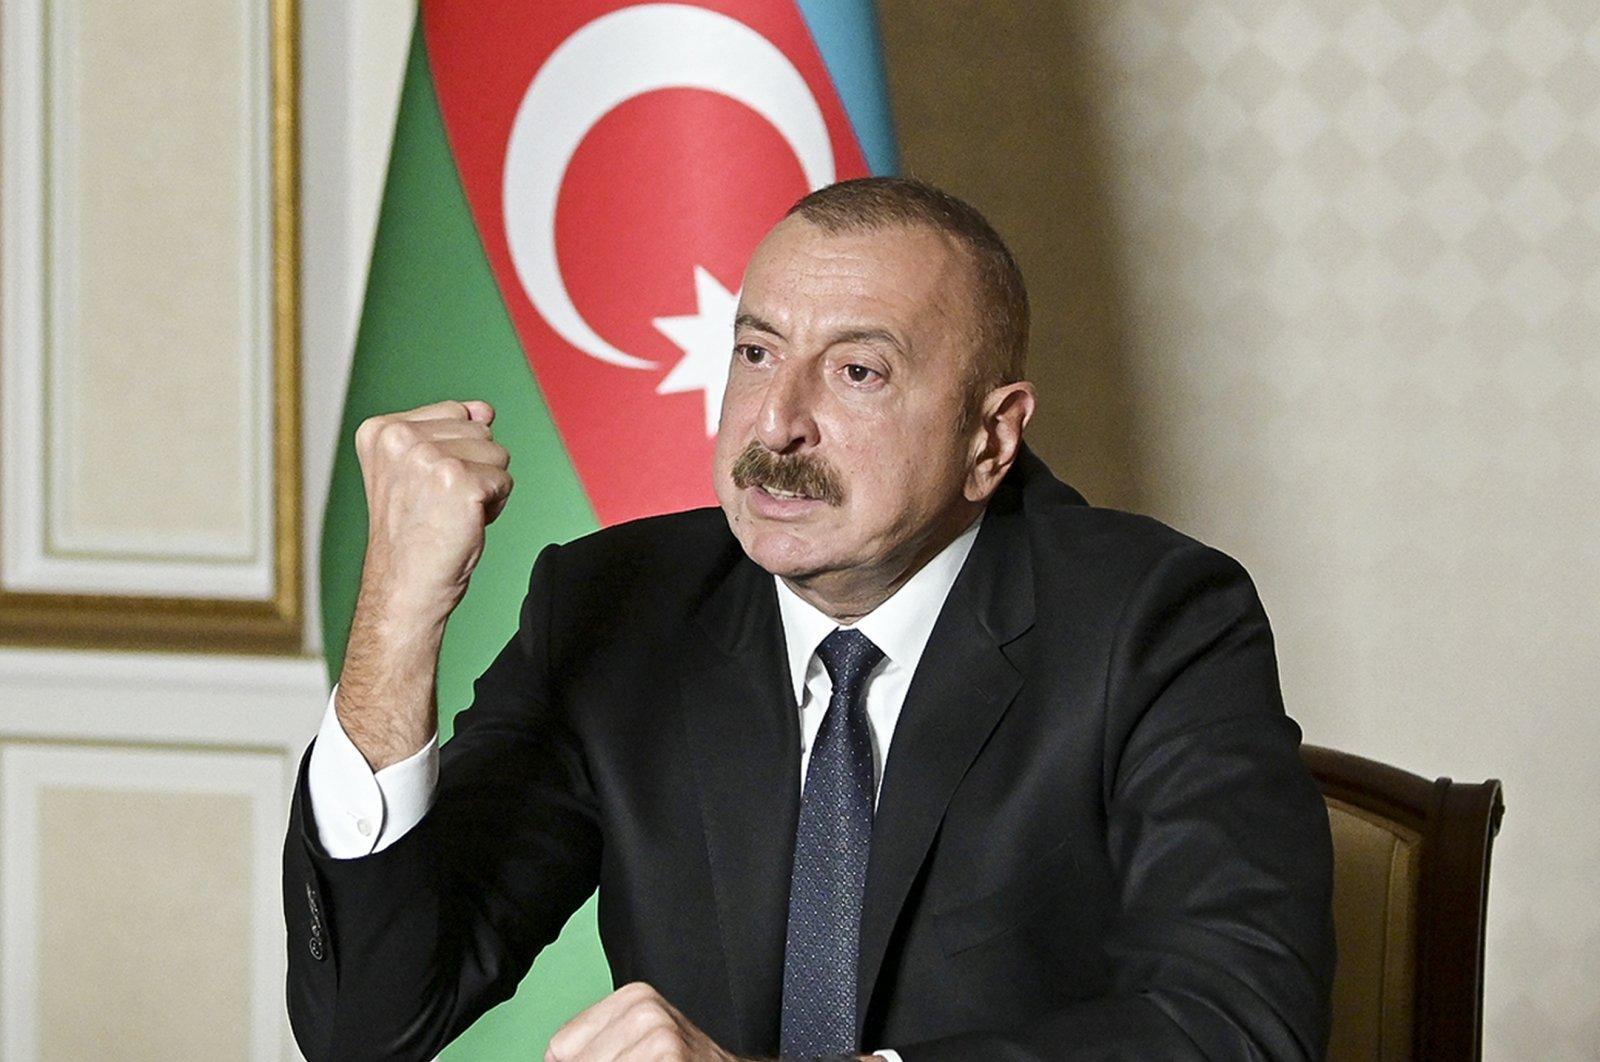 Azerbaijani President Ilham Aliyev gestures as he addresses the nation in Baku, Azerbaijan, Oct. 20, 2020. (AP)